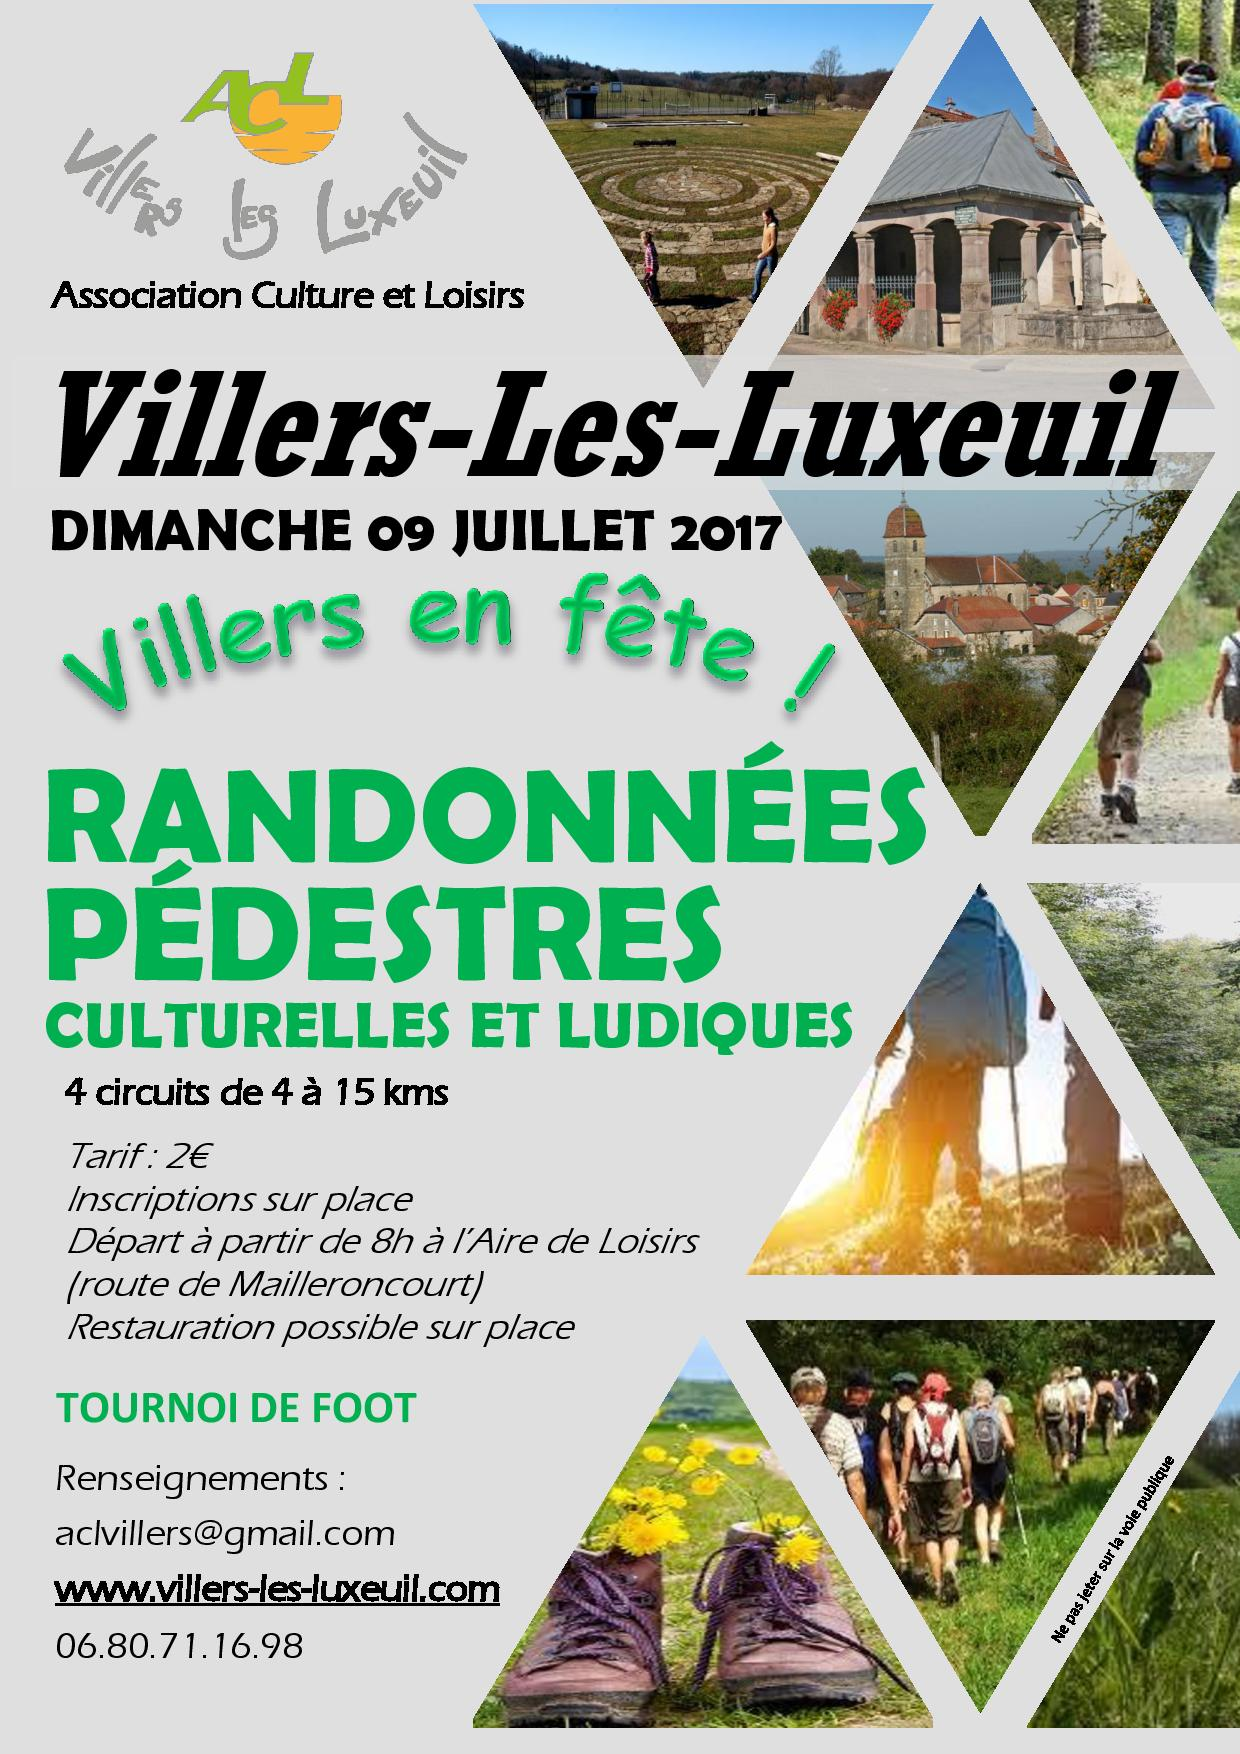 https://www.villers-les-luxeuil.com/projets/villers/files/images/2017_Evenements/Presse/Tract_Villers_En_Fete_2017ok.jpg